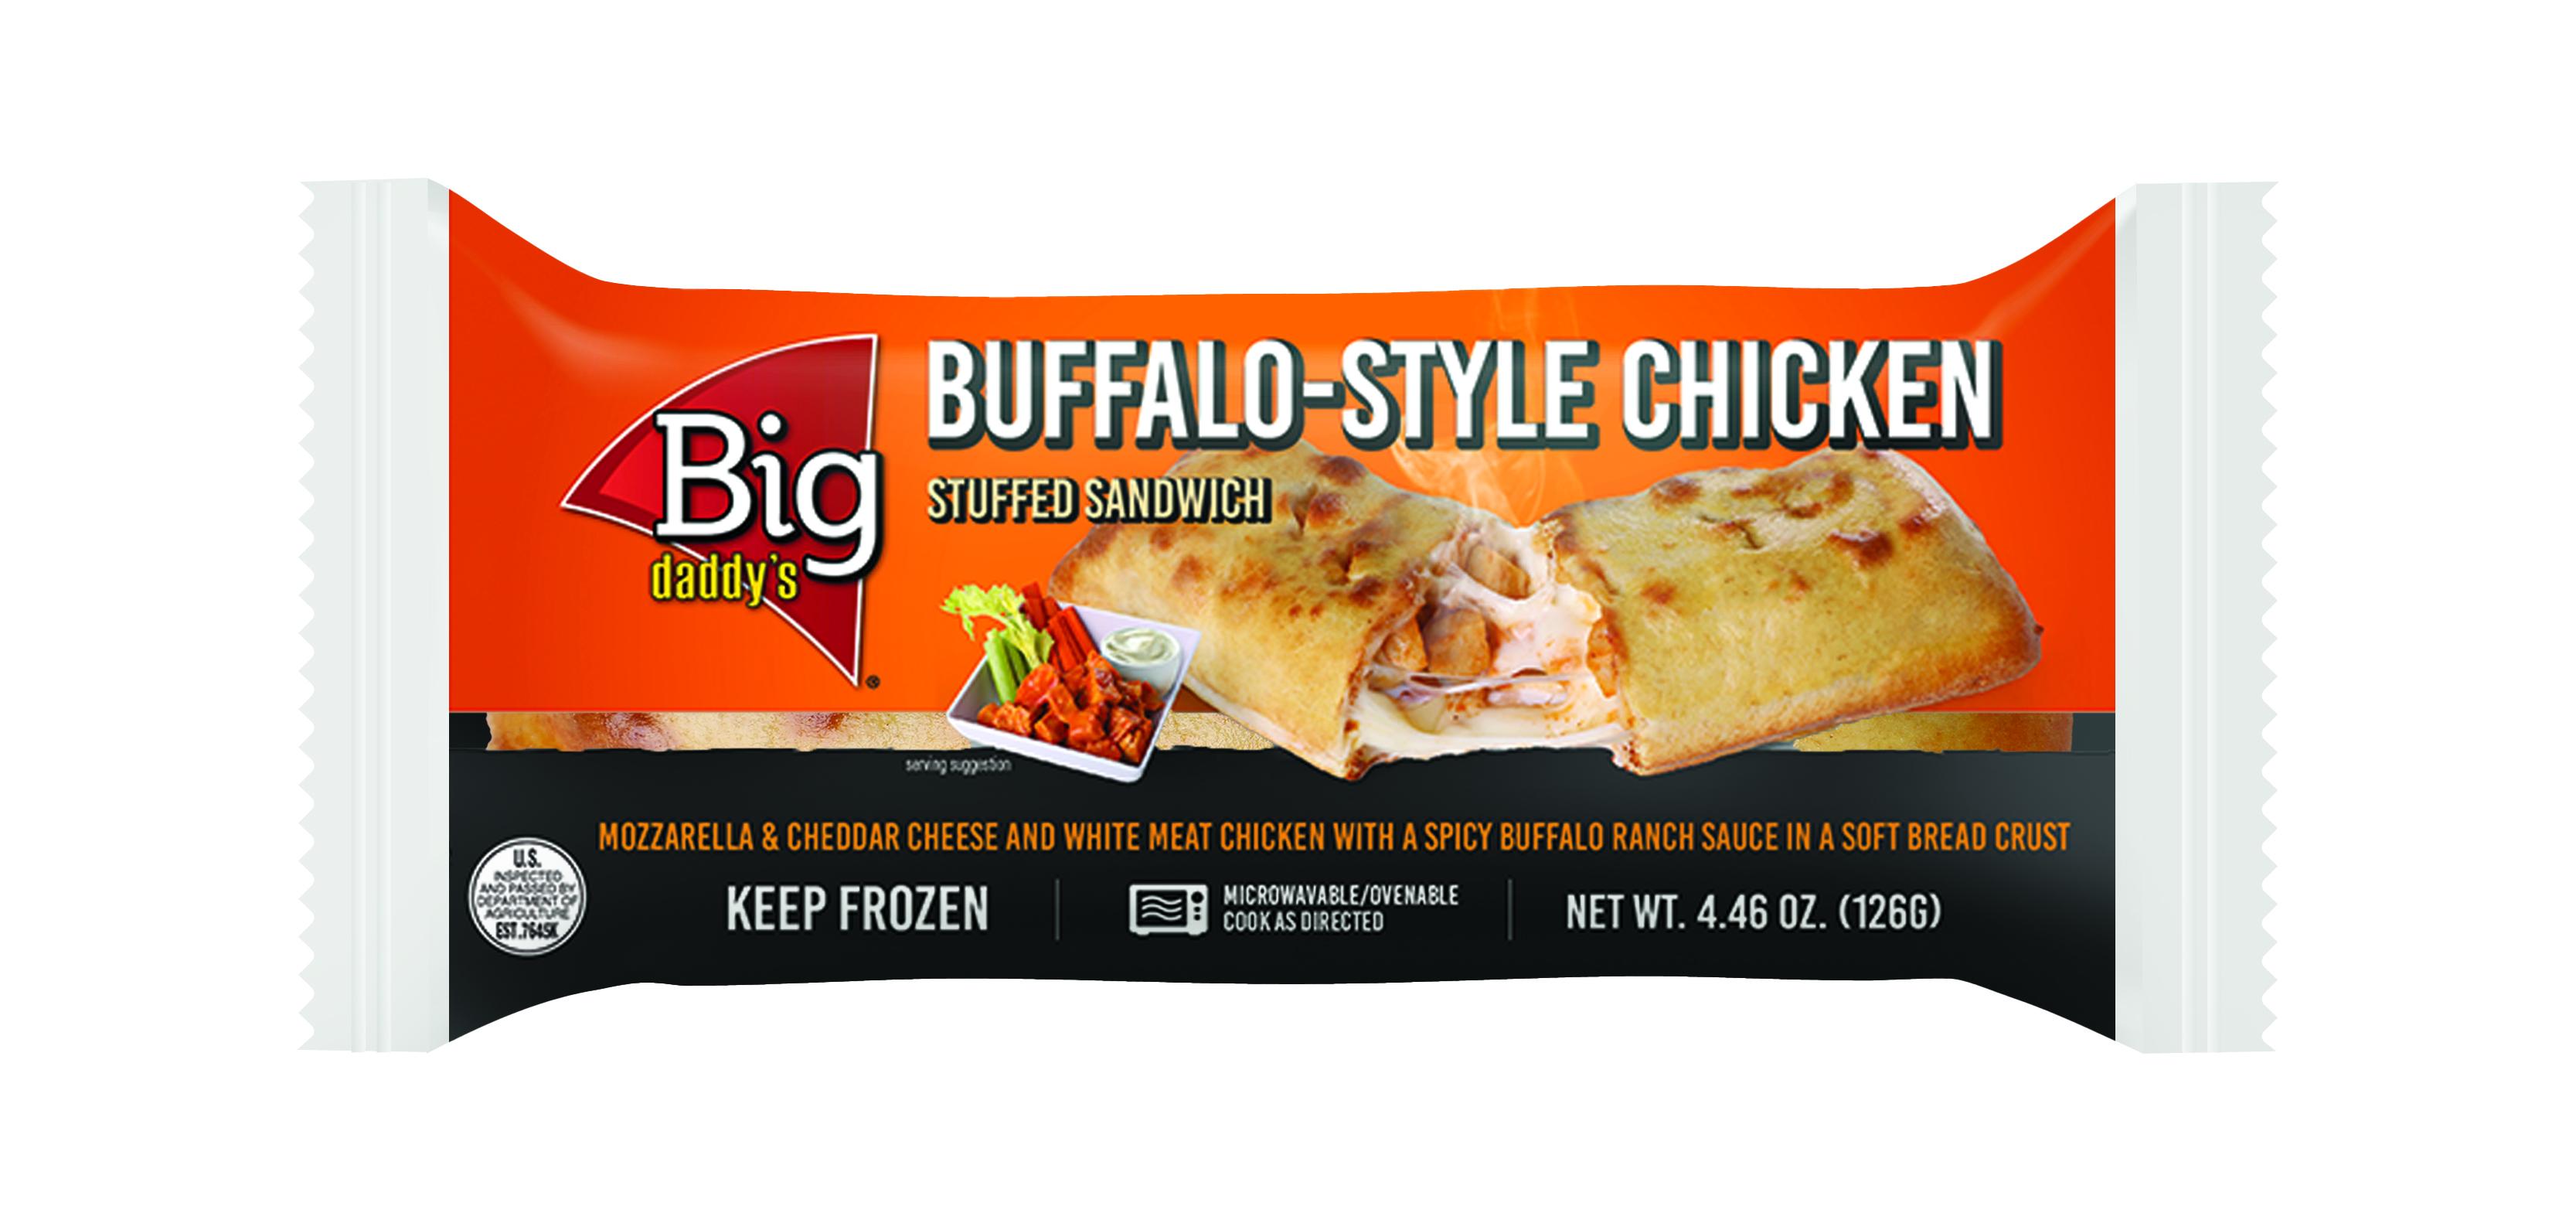 big_daddy_s_51_wg_buffalo_style_chicken_stuffed_sandwich_iw-55292